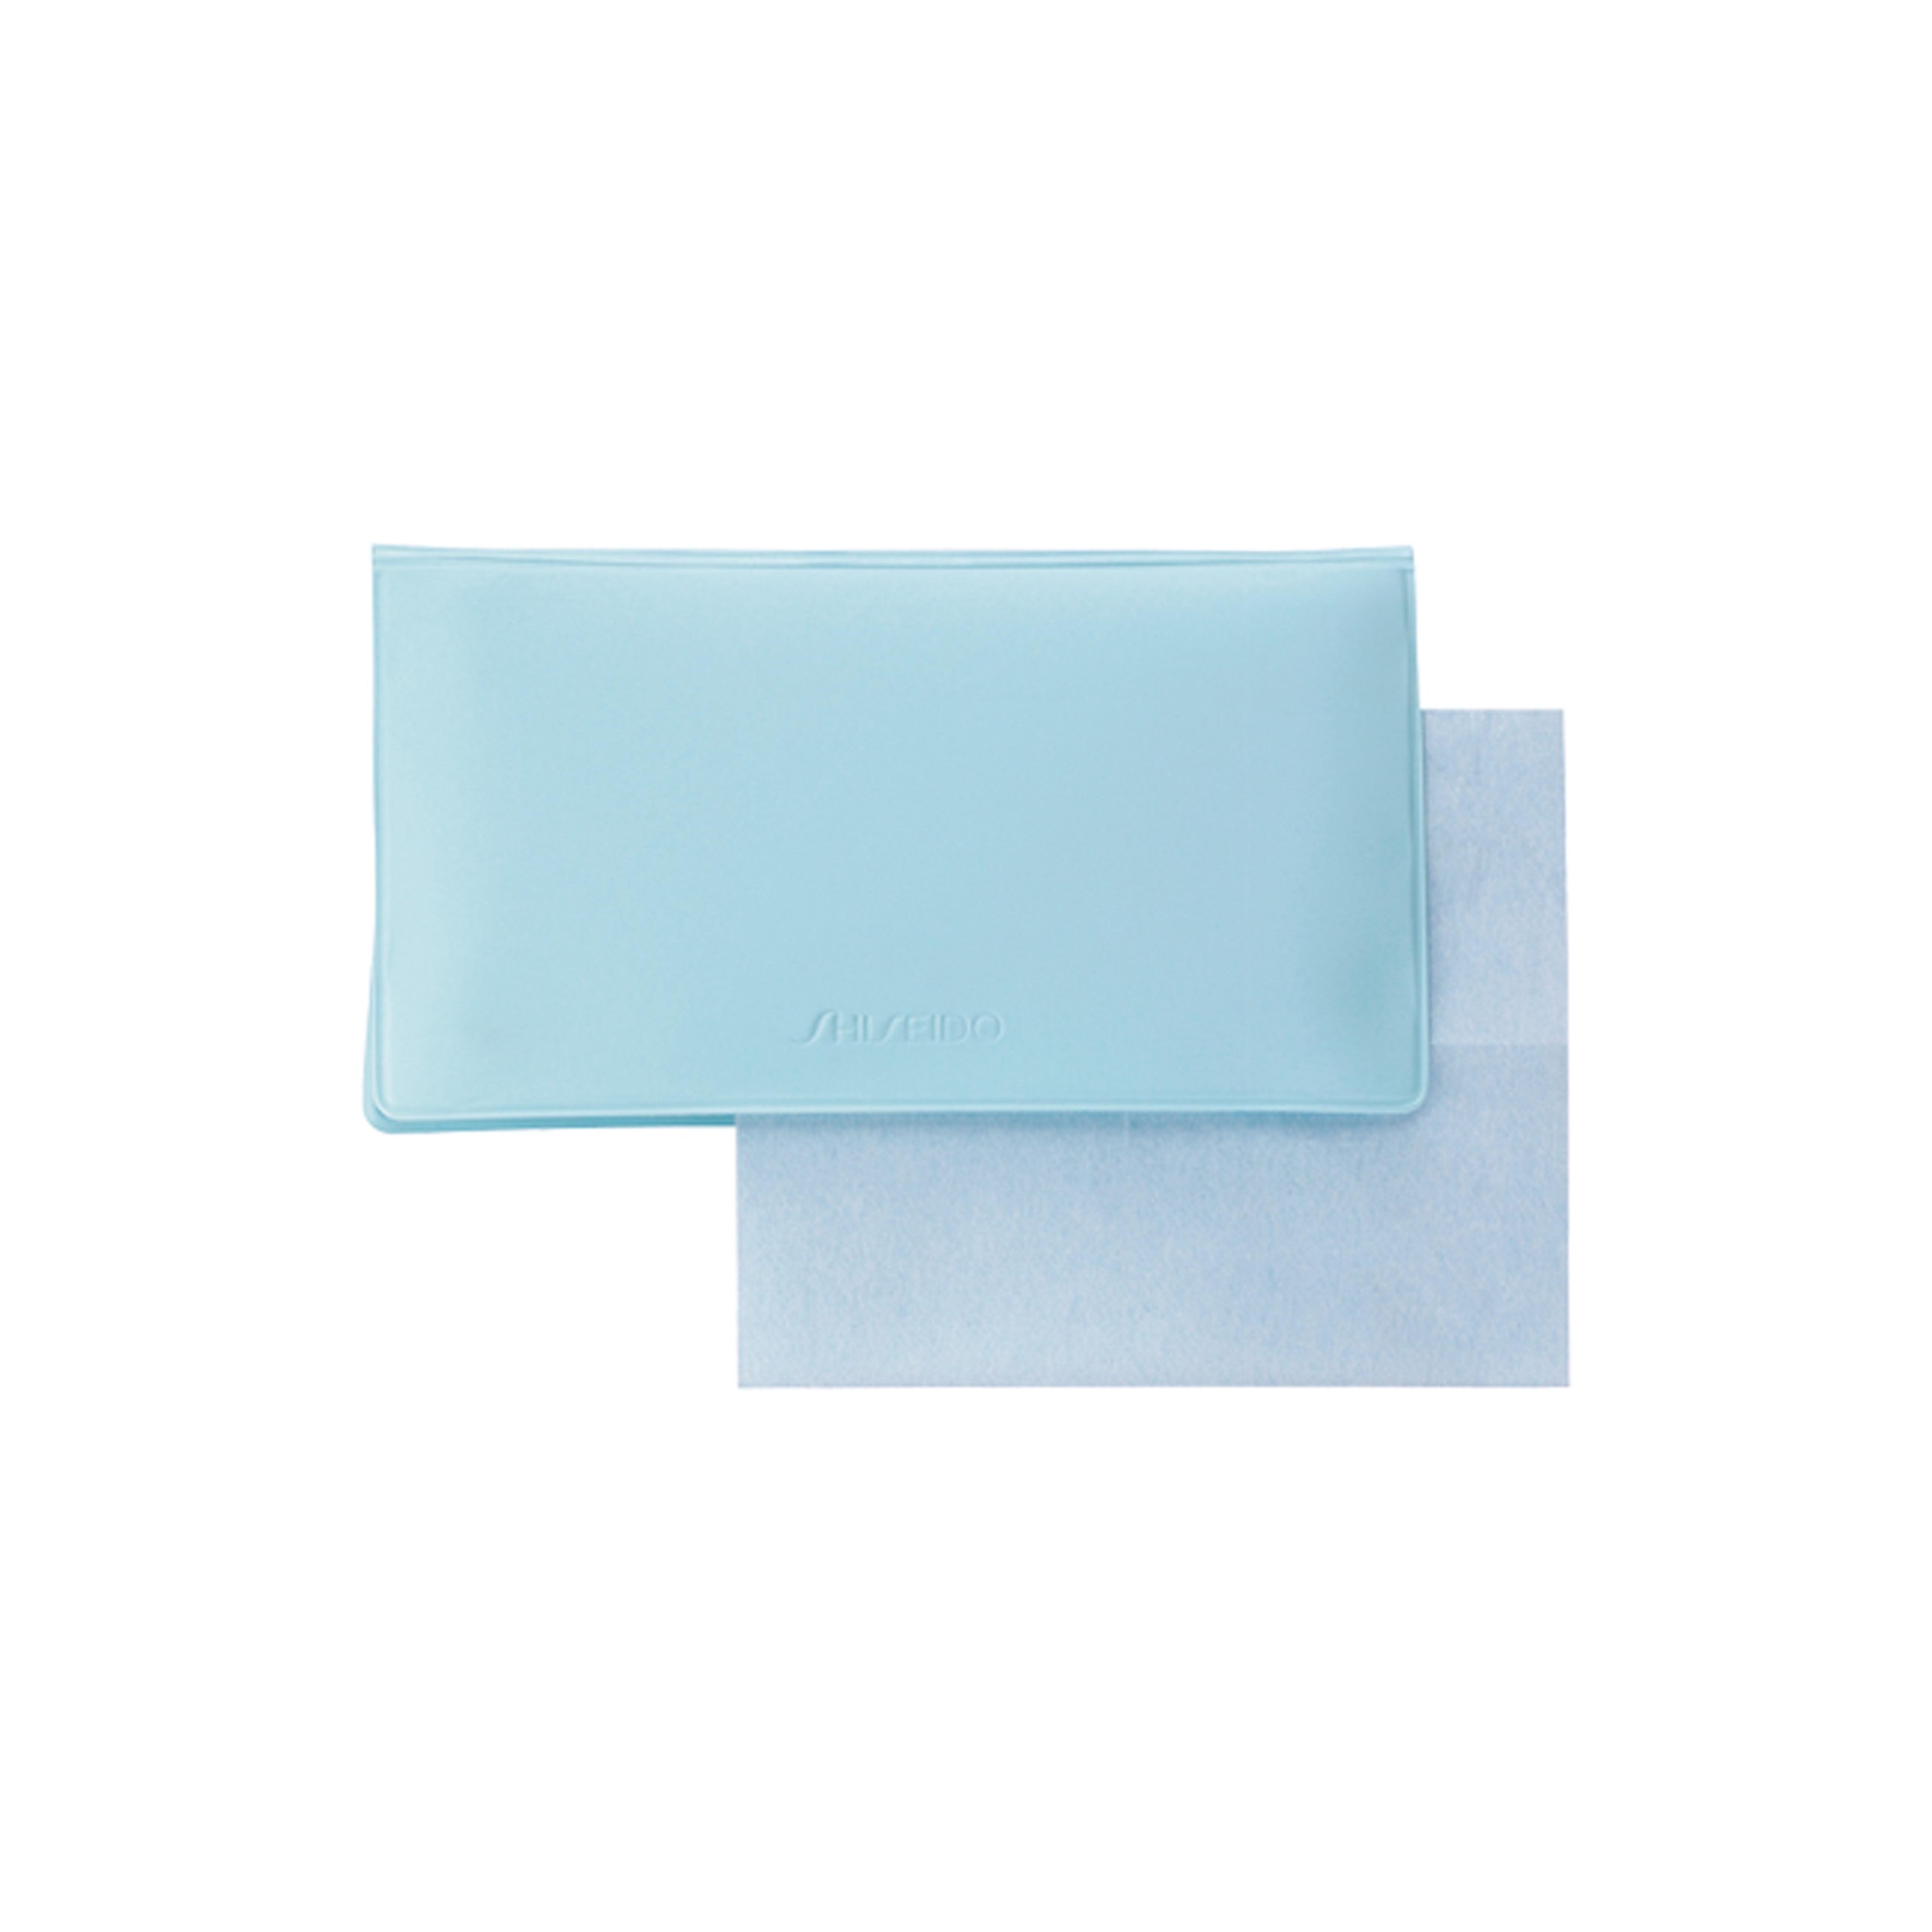 Shiseido Pureness Oil-Control Blotting Paper